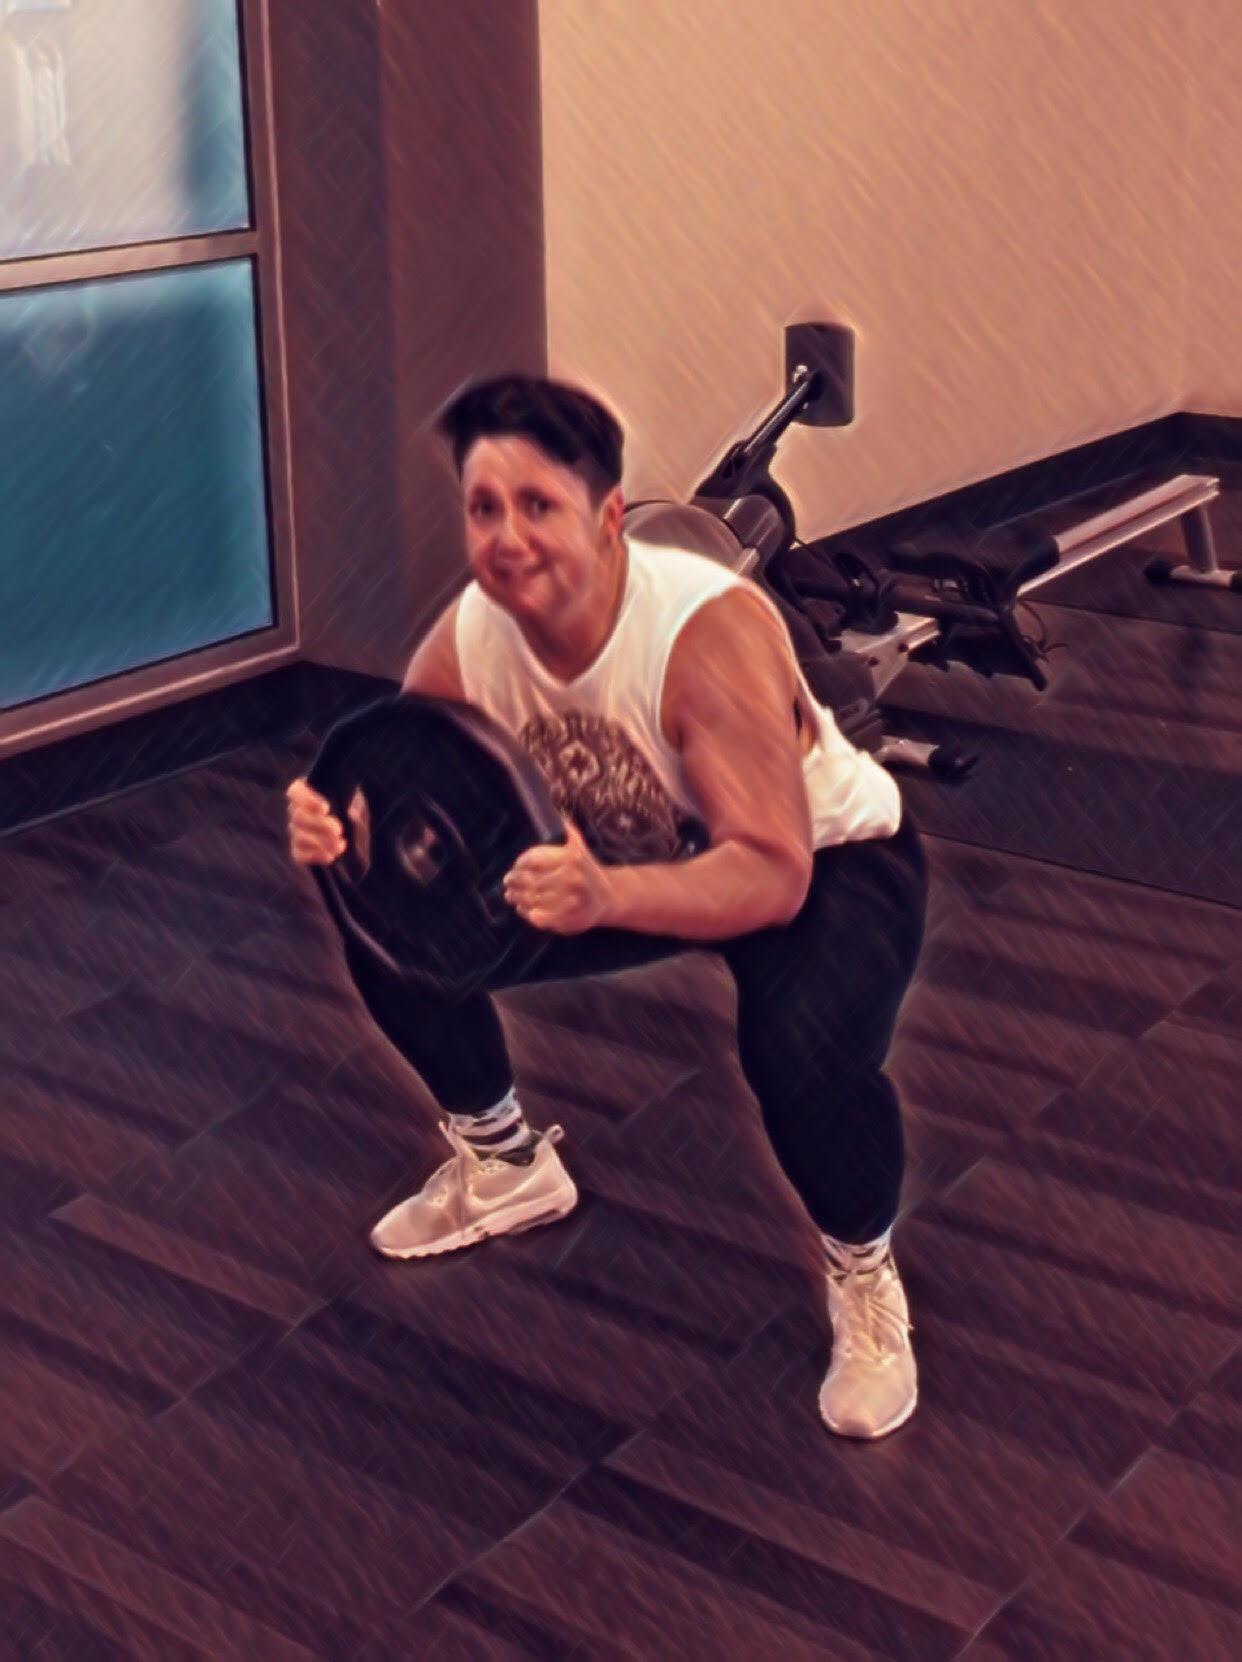 Super Fitness Training Client Squat